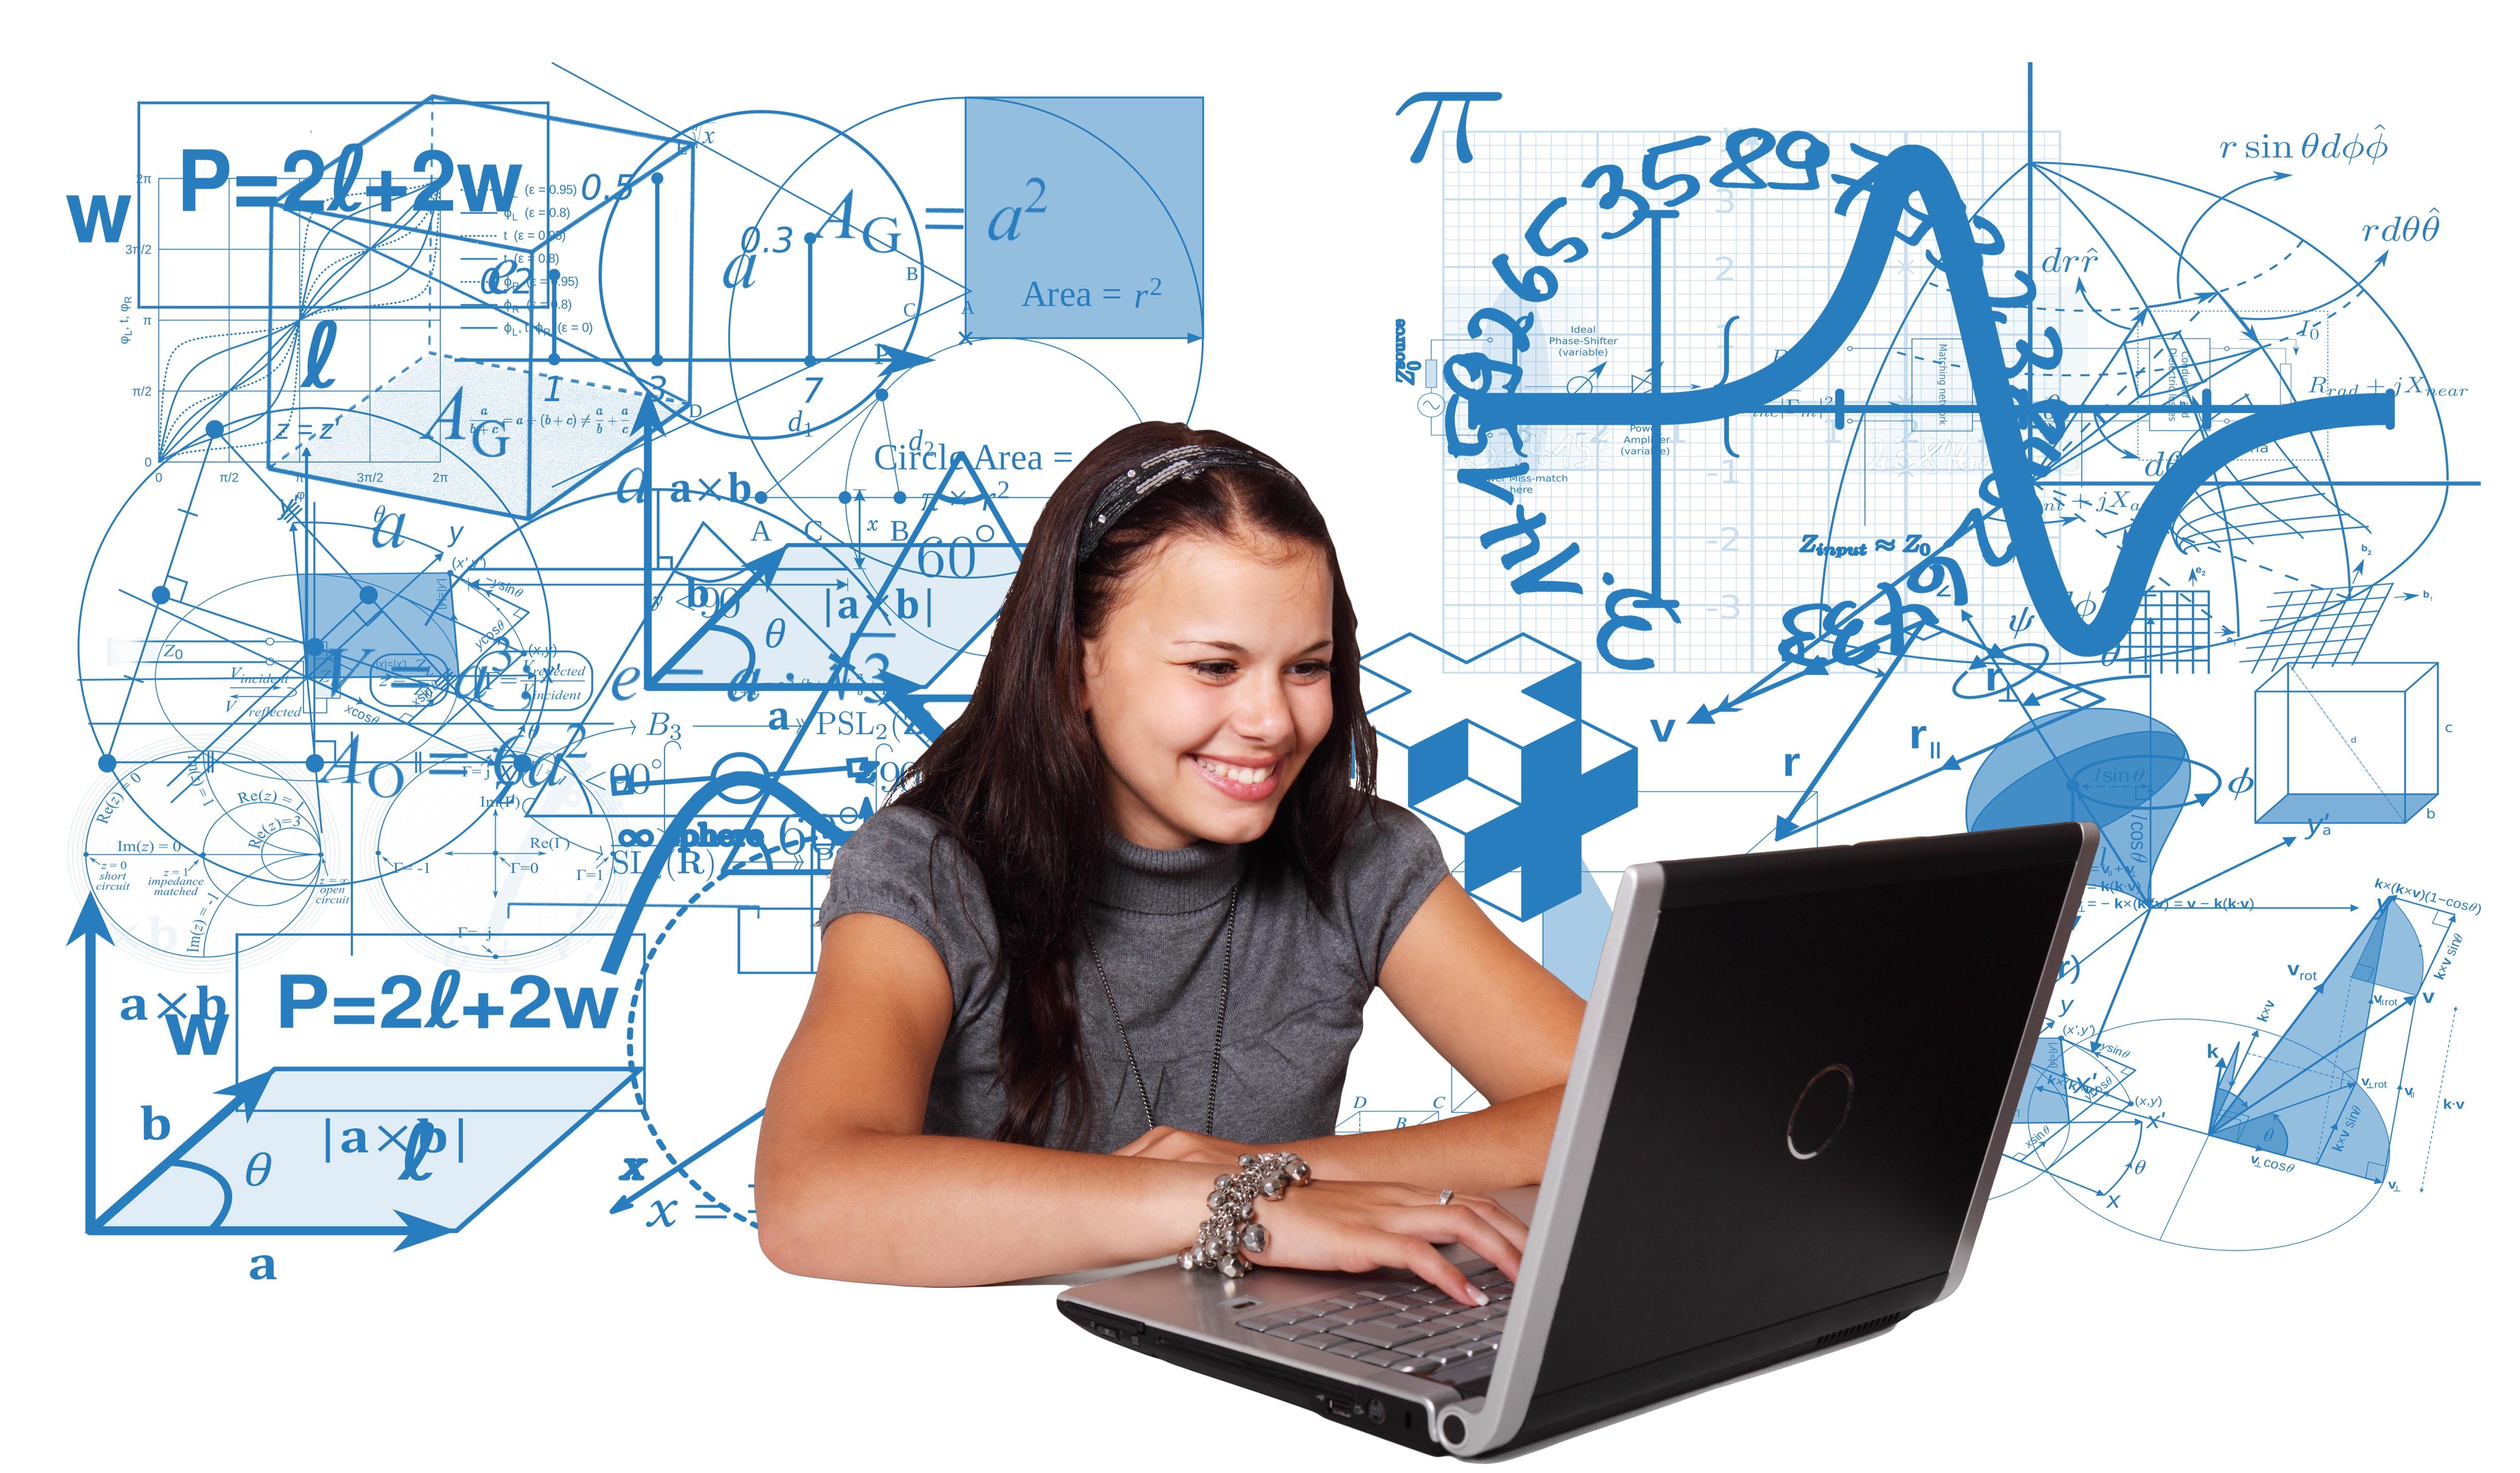 Gambar Laptop Komputer Penulisan Naik Gadis Teknologi Simbol